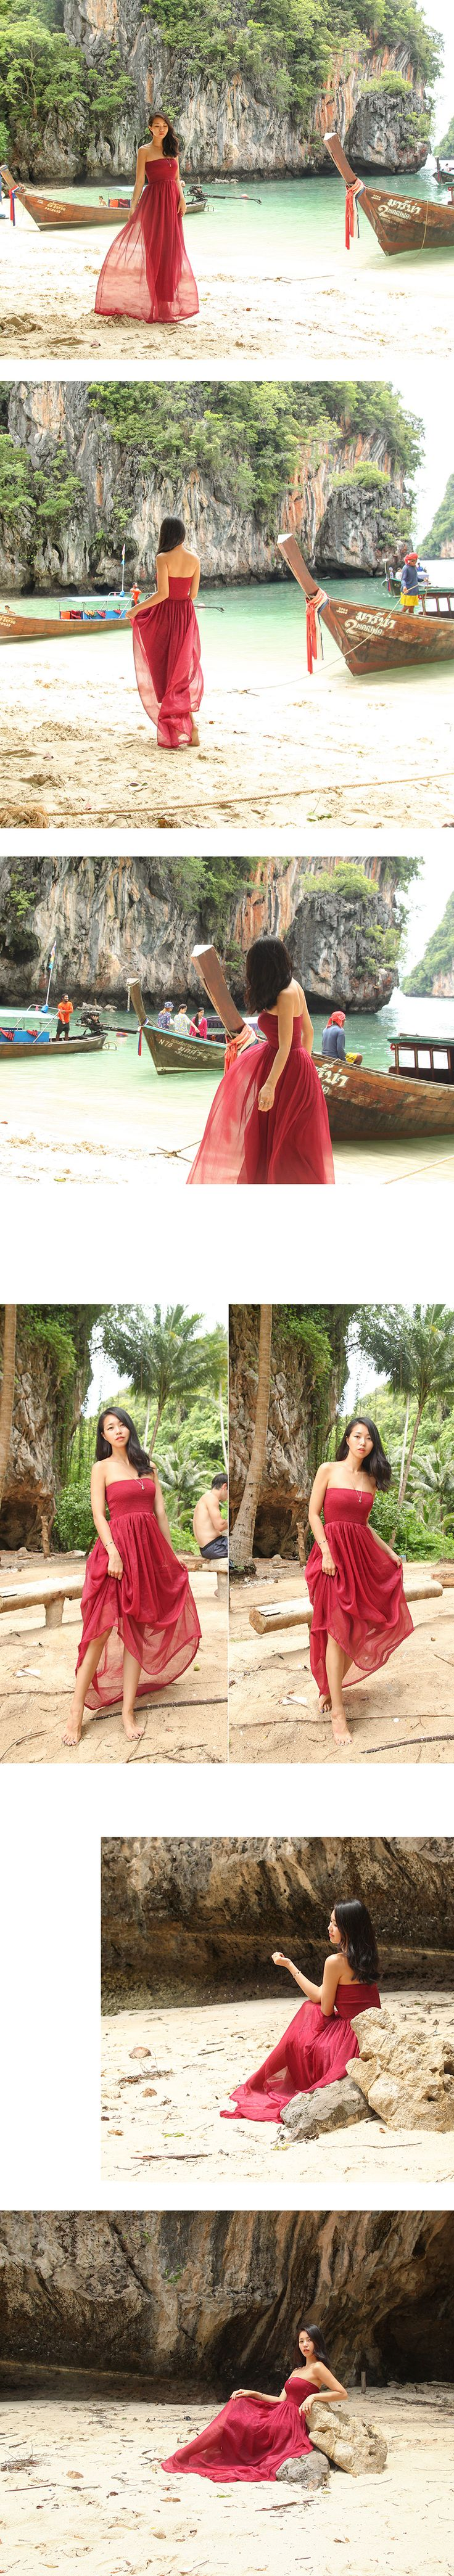 MAXILOOK [[당일배송]Red/Wine chiffon maxi dress레드/와인 스모그 맥시드레스-MM1612015 SUMMER 신상컬러!]